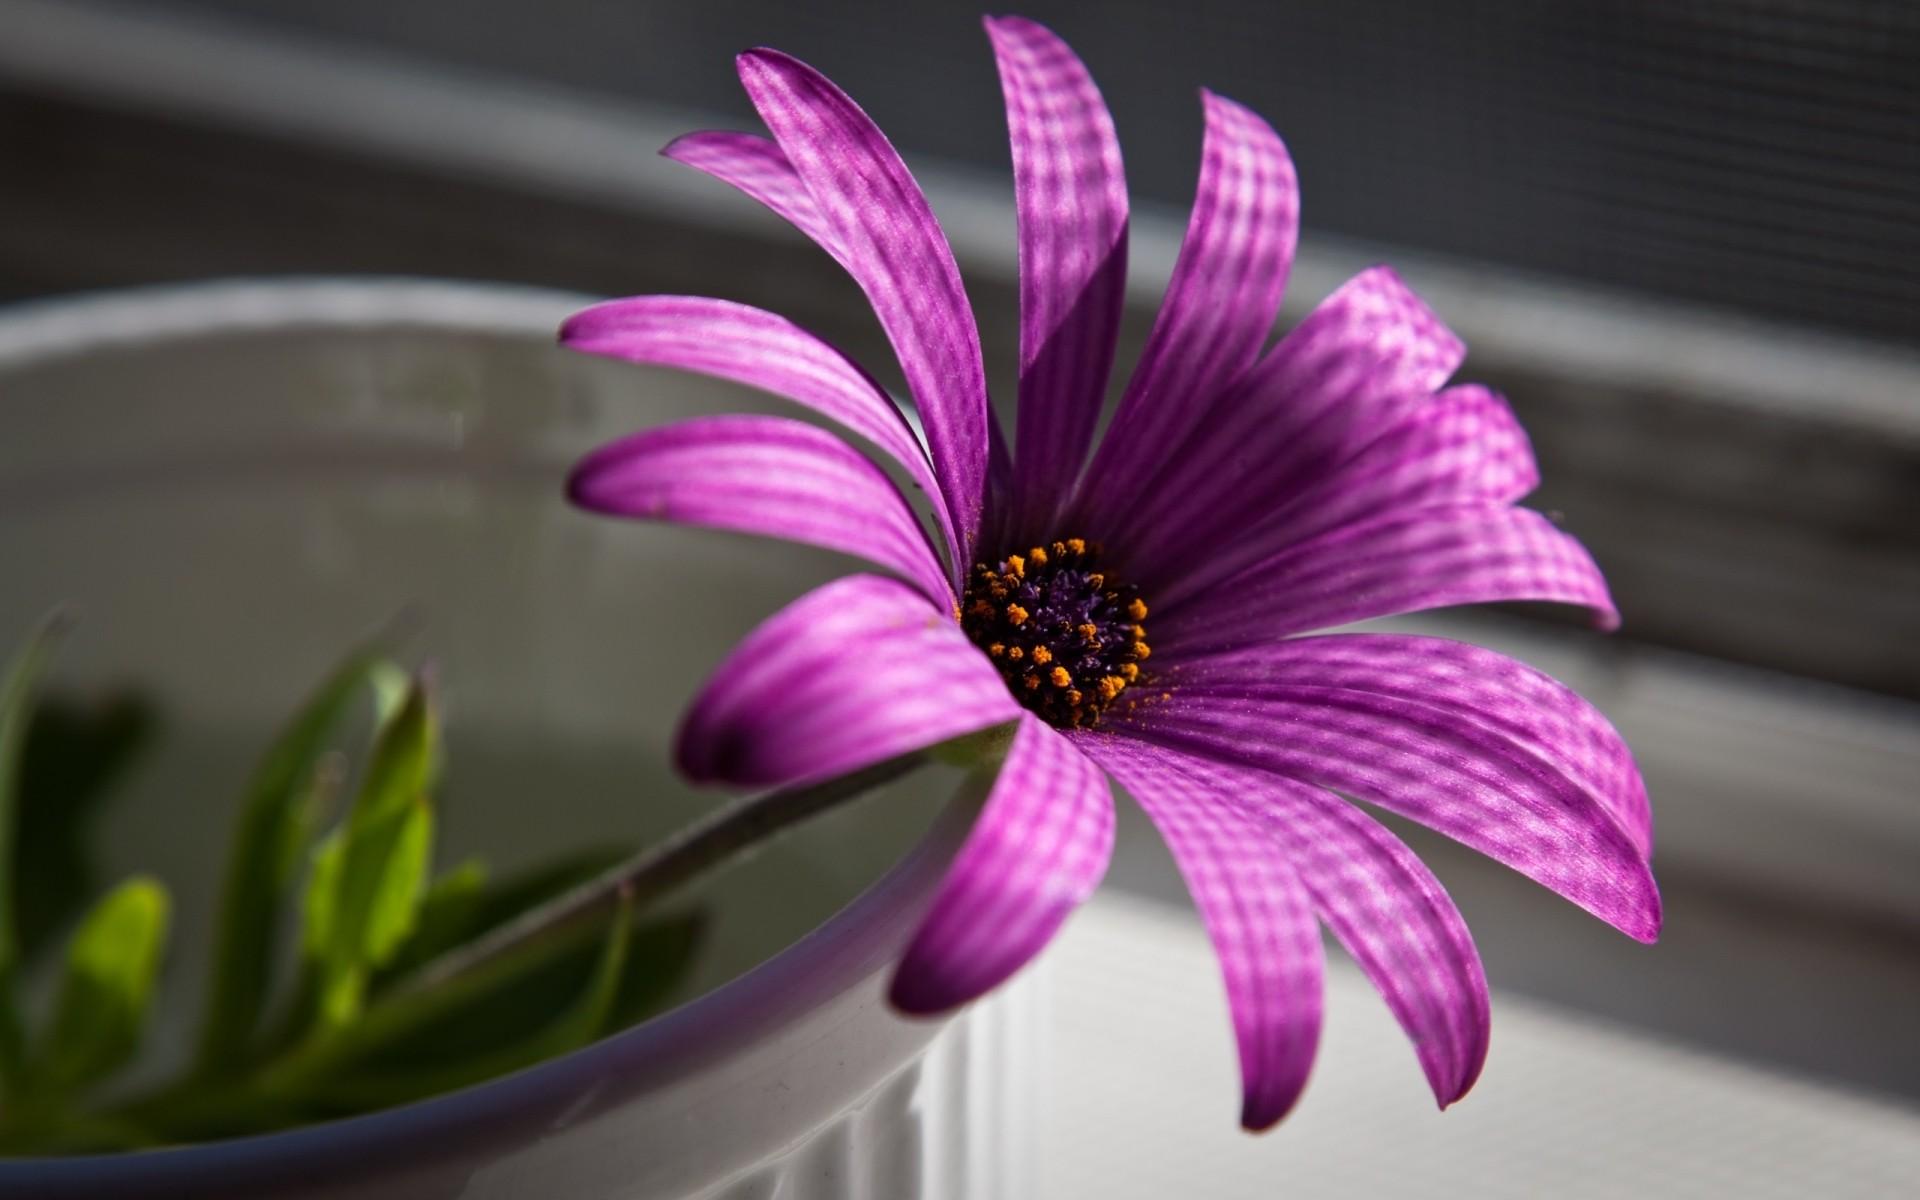 Цветы картинки на рабочий стол андроид